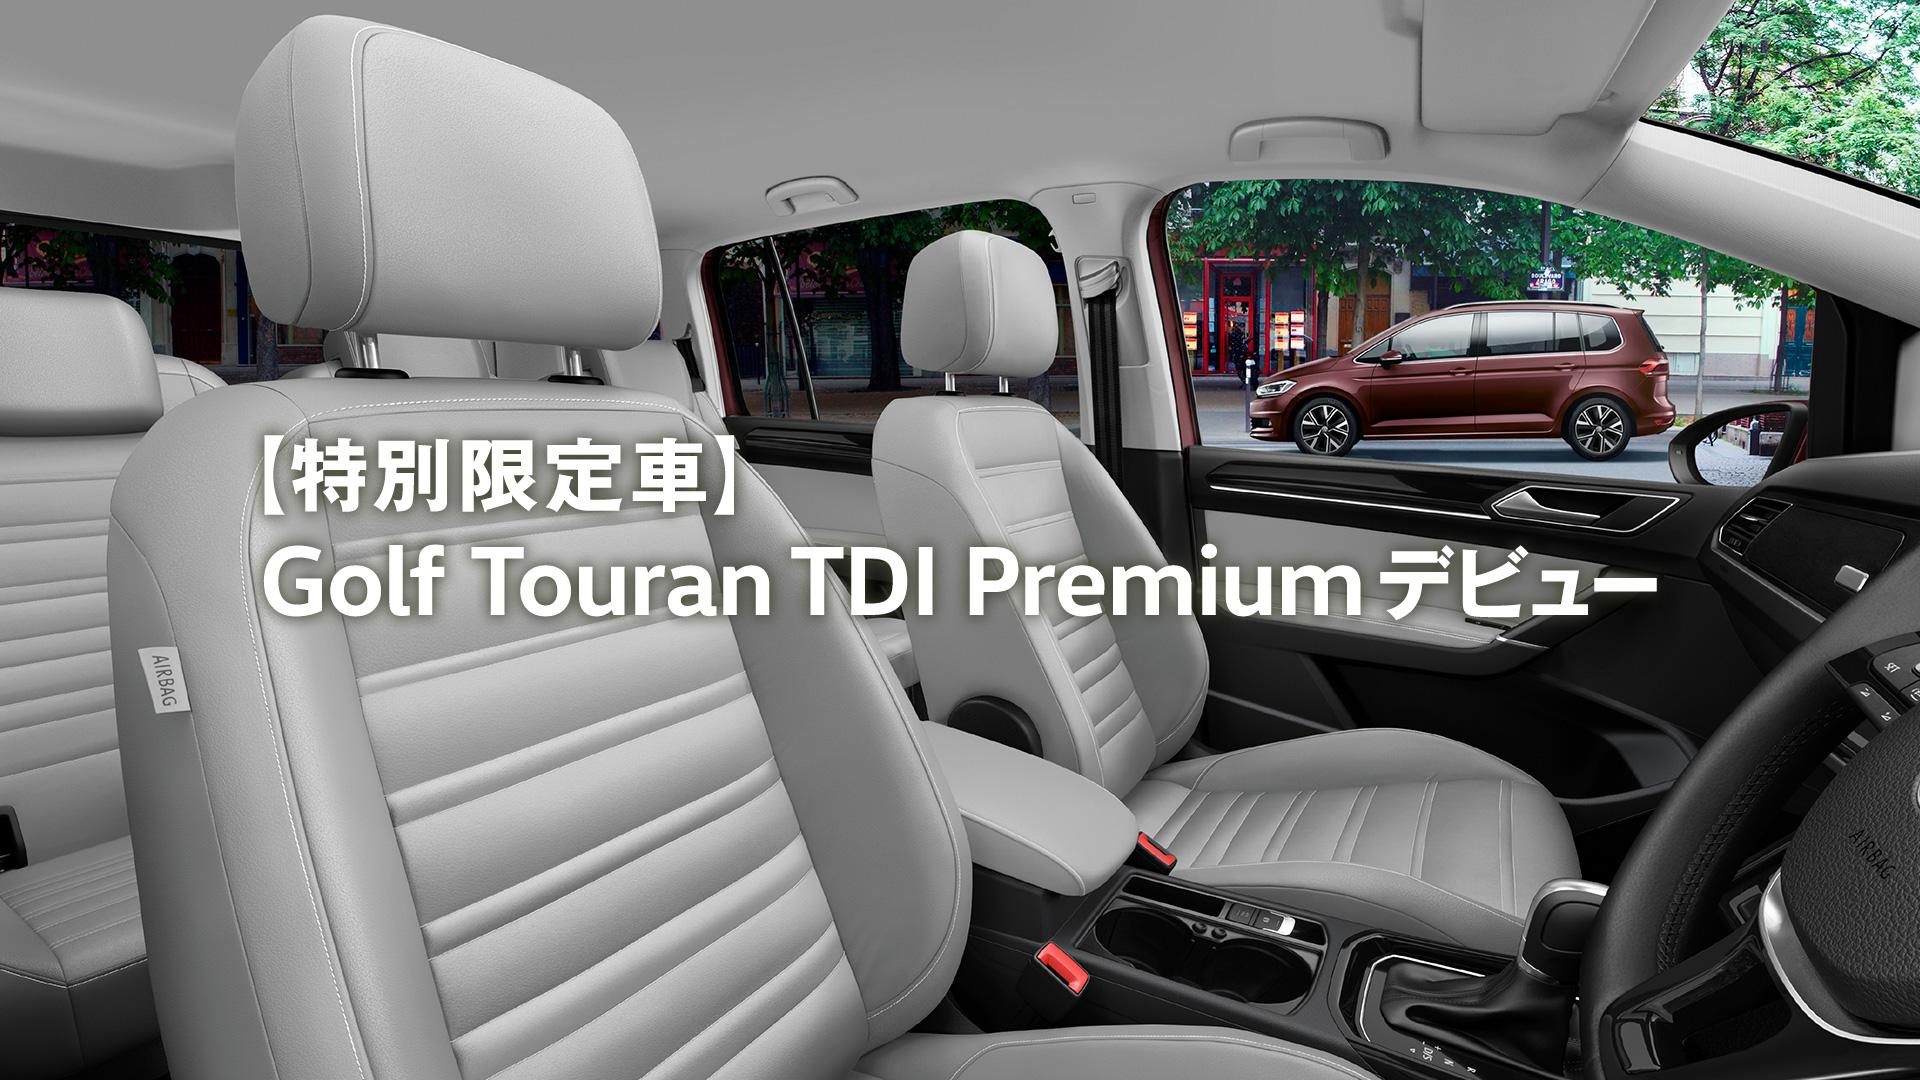 Golf Touran TDI Premium